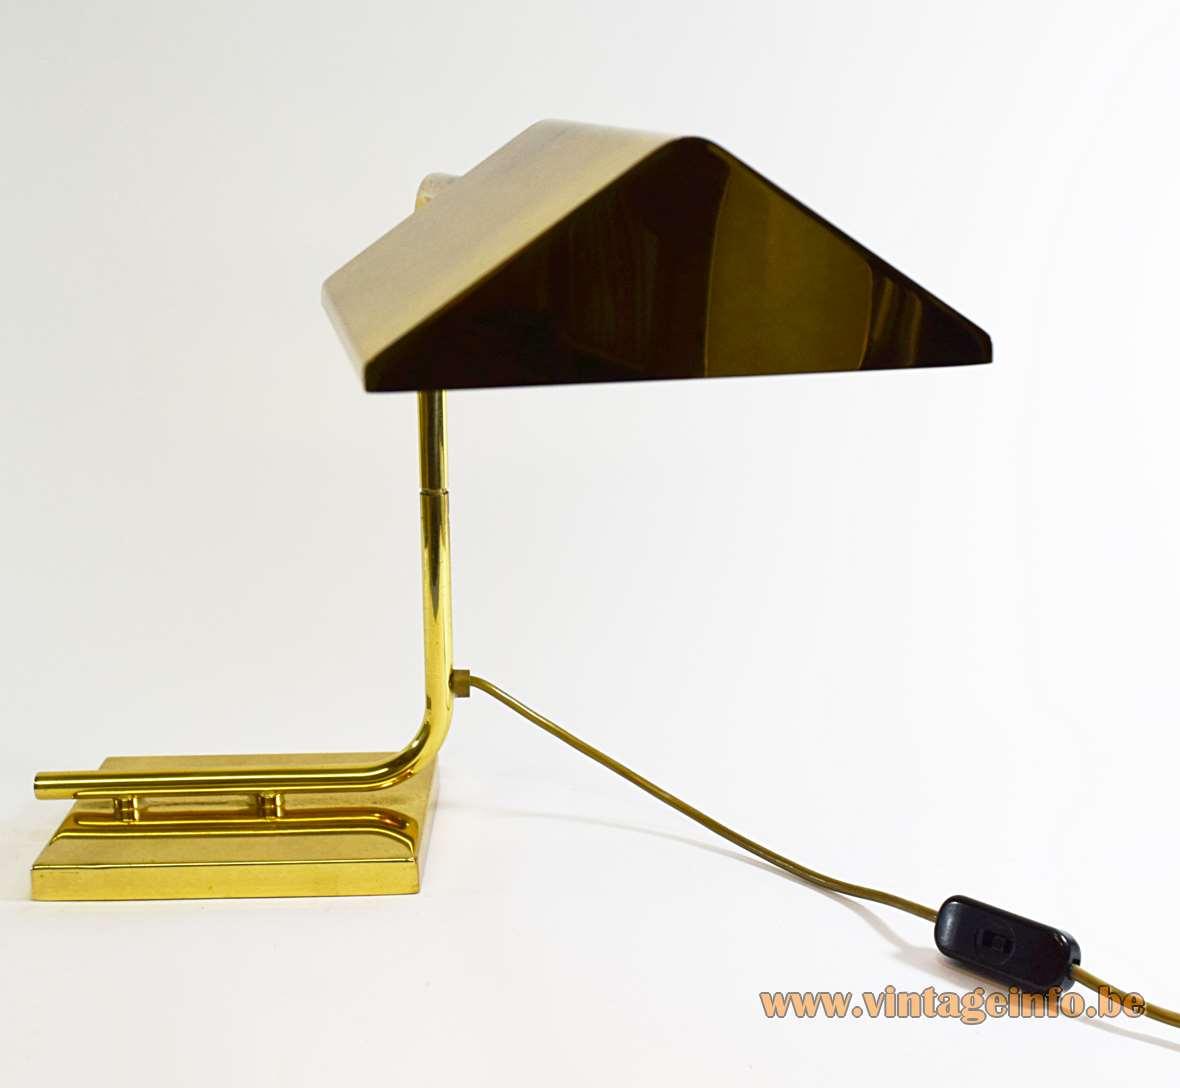 Egoluce Brass Desk Lamp swing arm 1970s 1980s MCM Italy cast iron counterweight